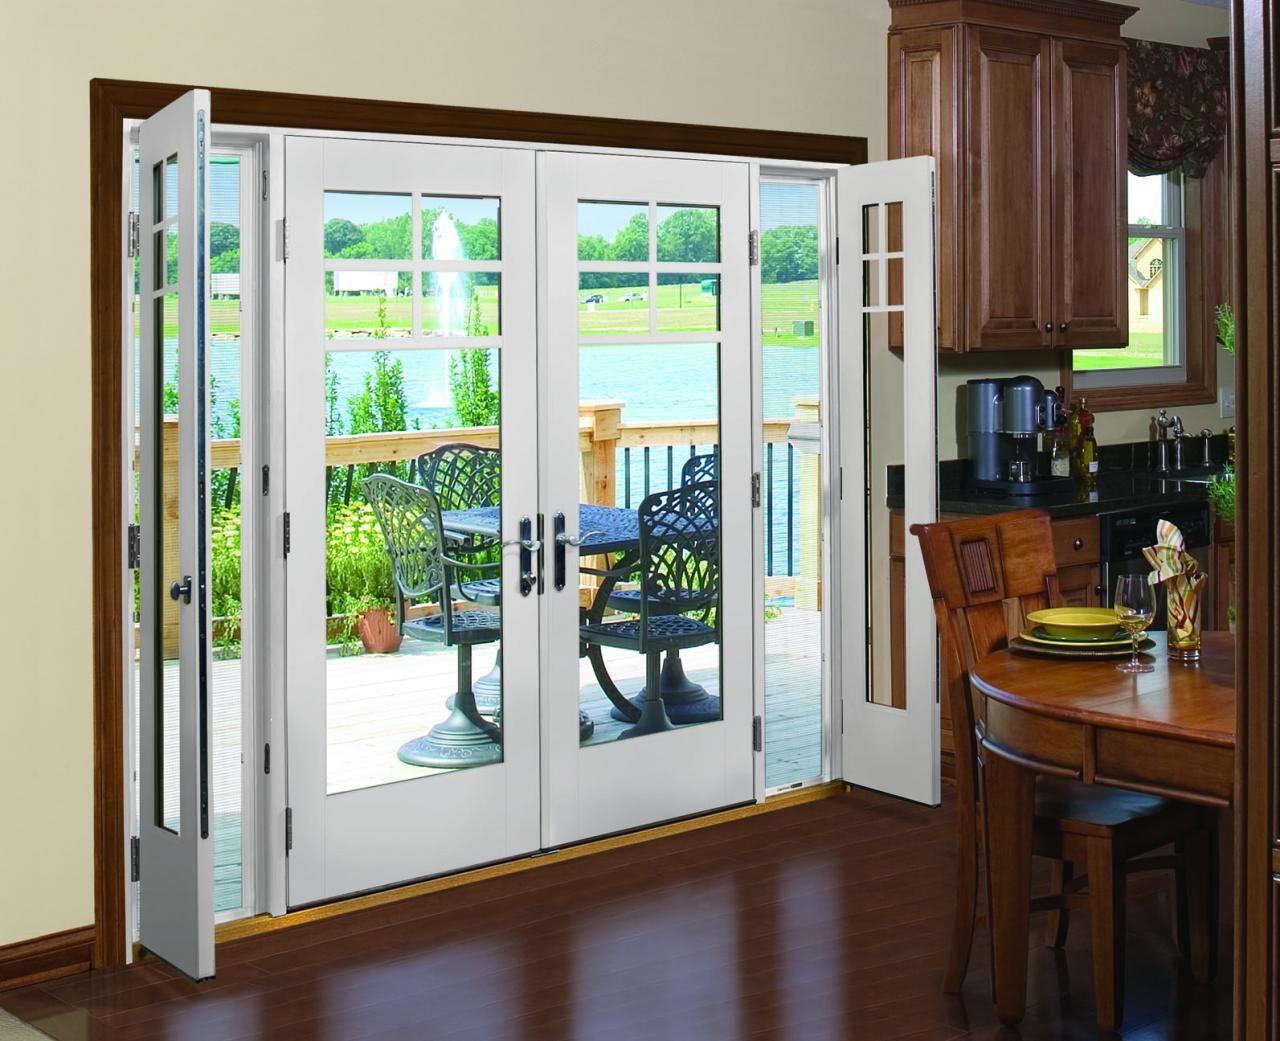 11 therma tru patio doors ideas patio